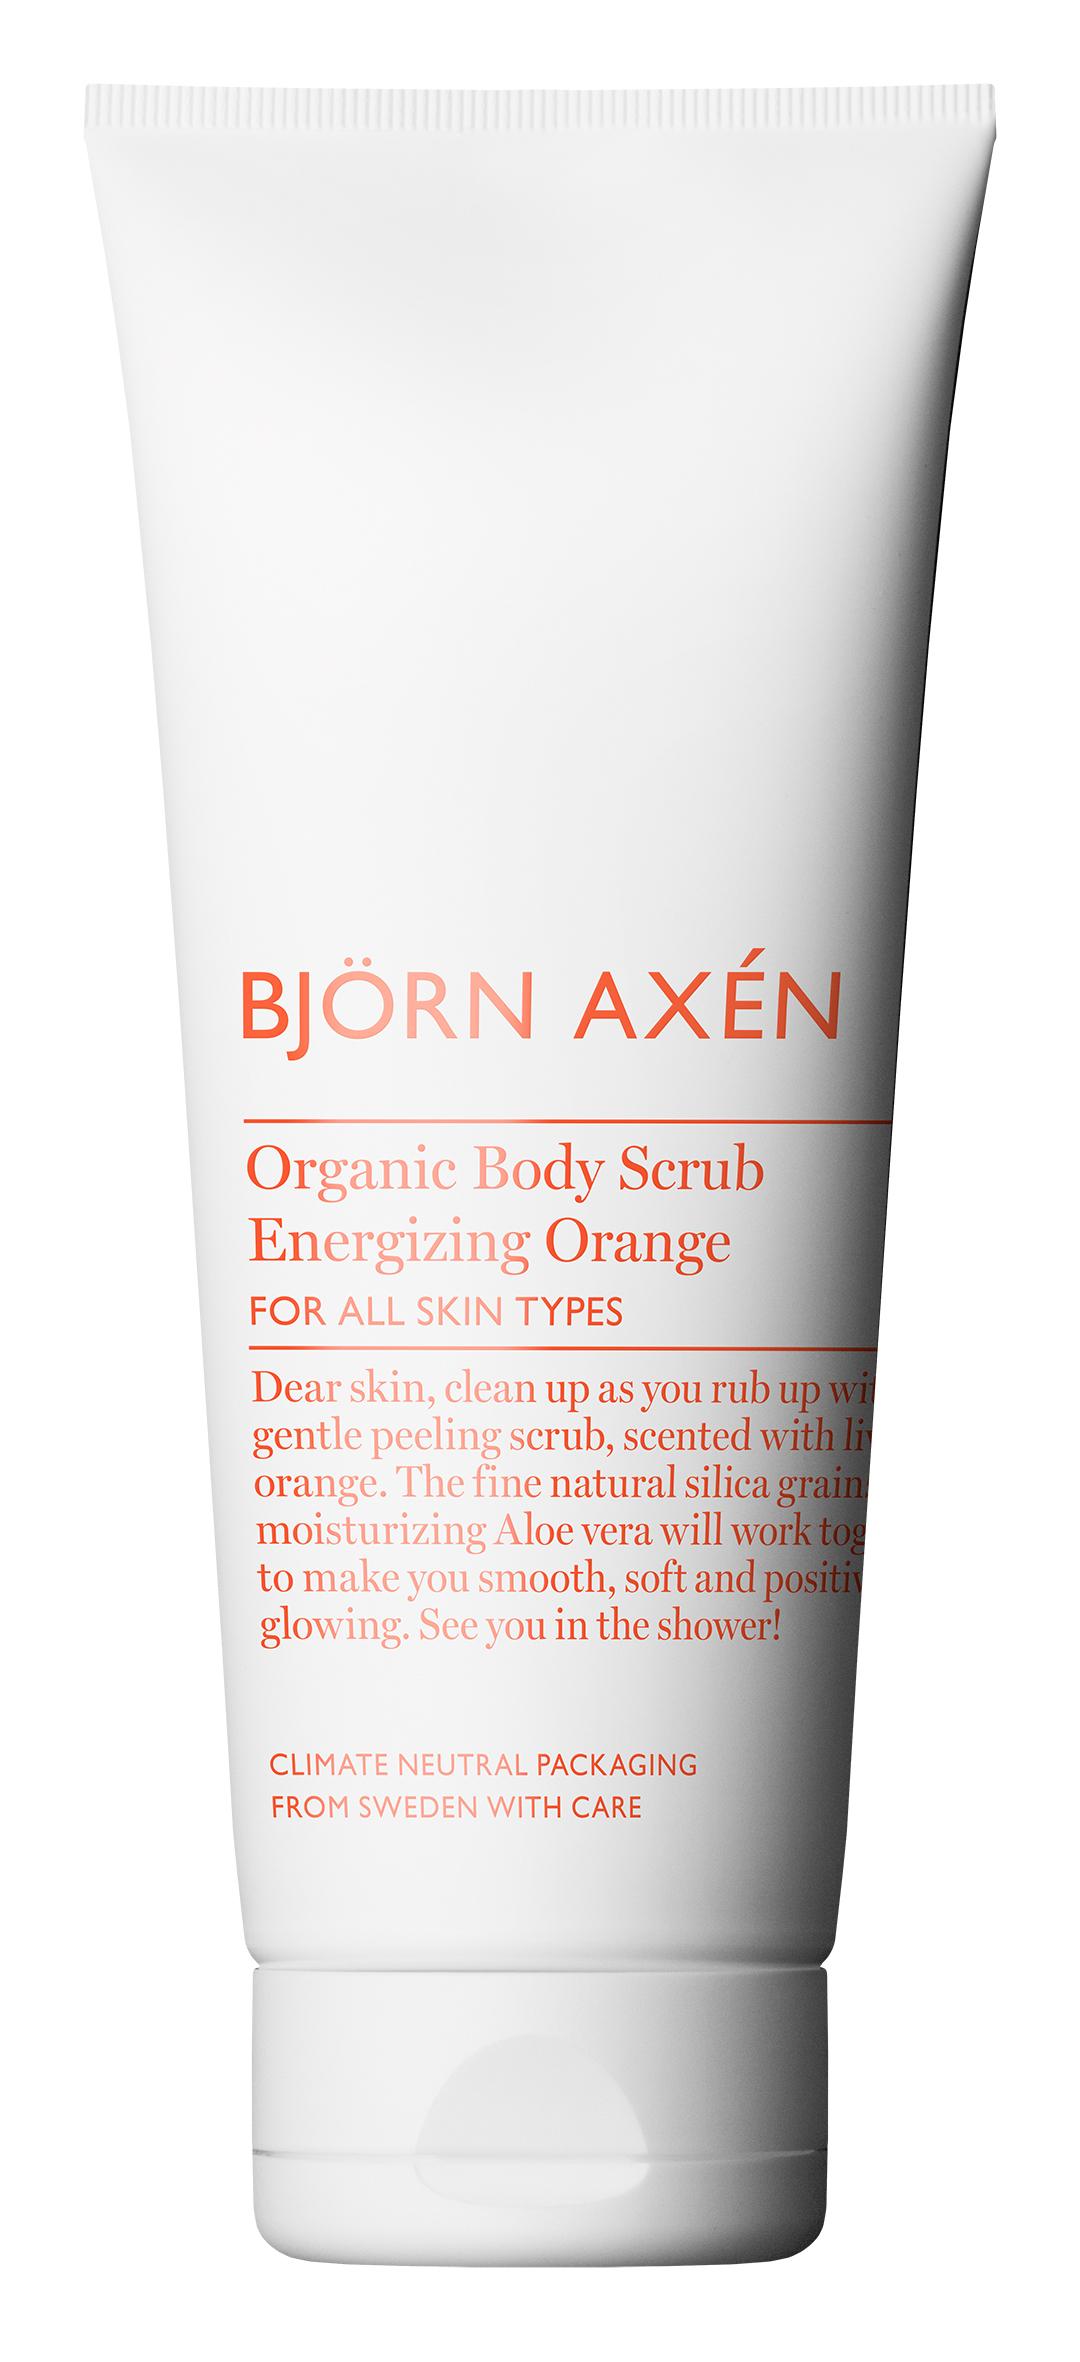 Organic Body Scrub Energizing Orange